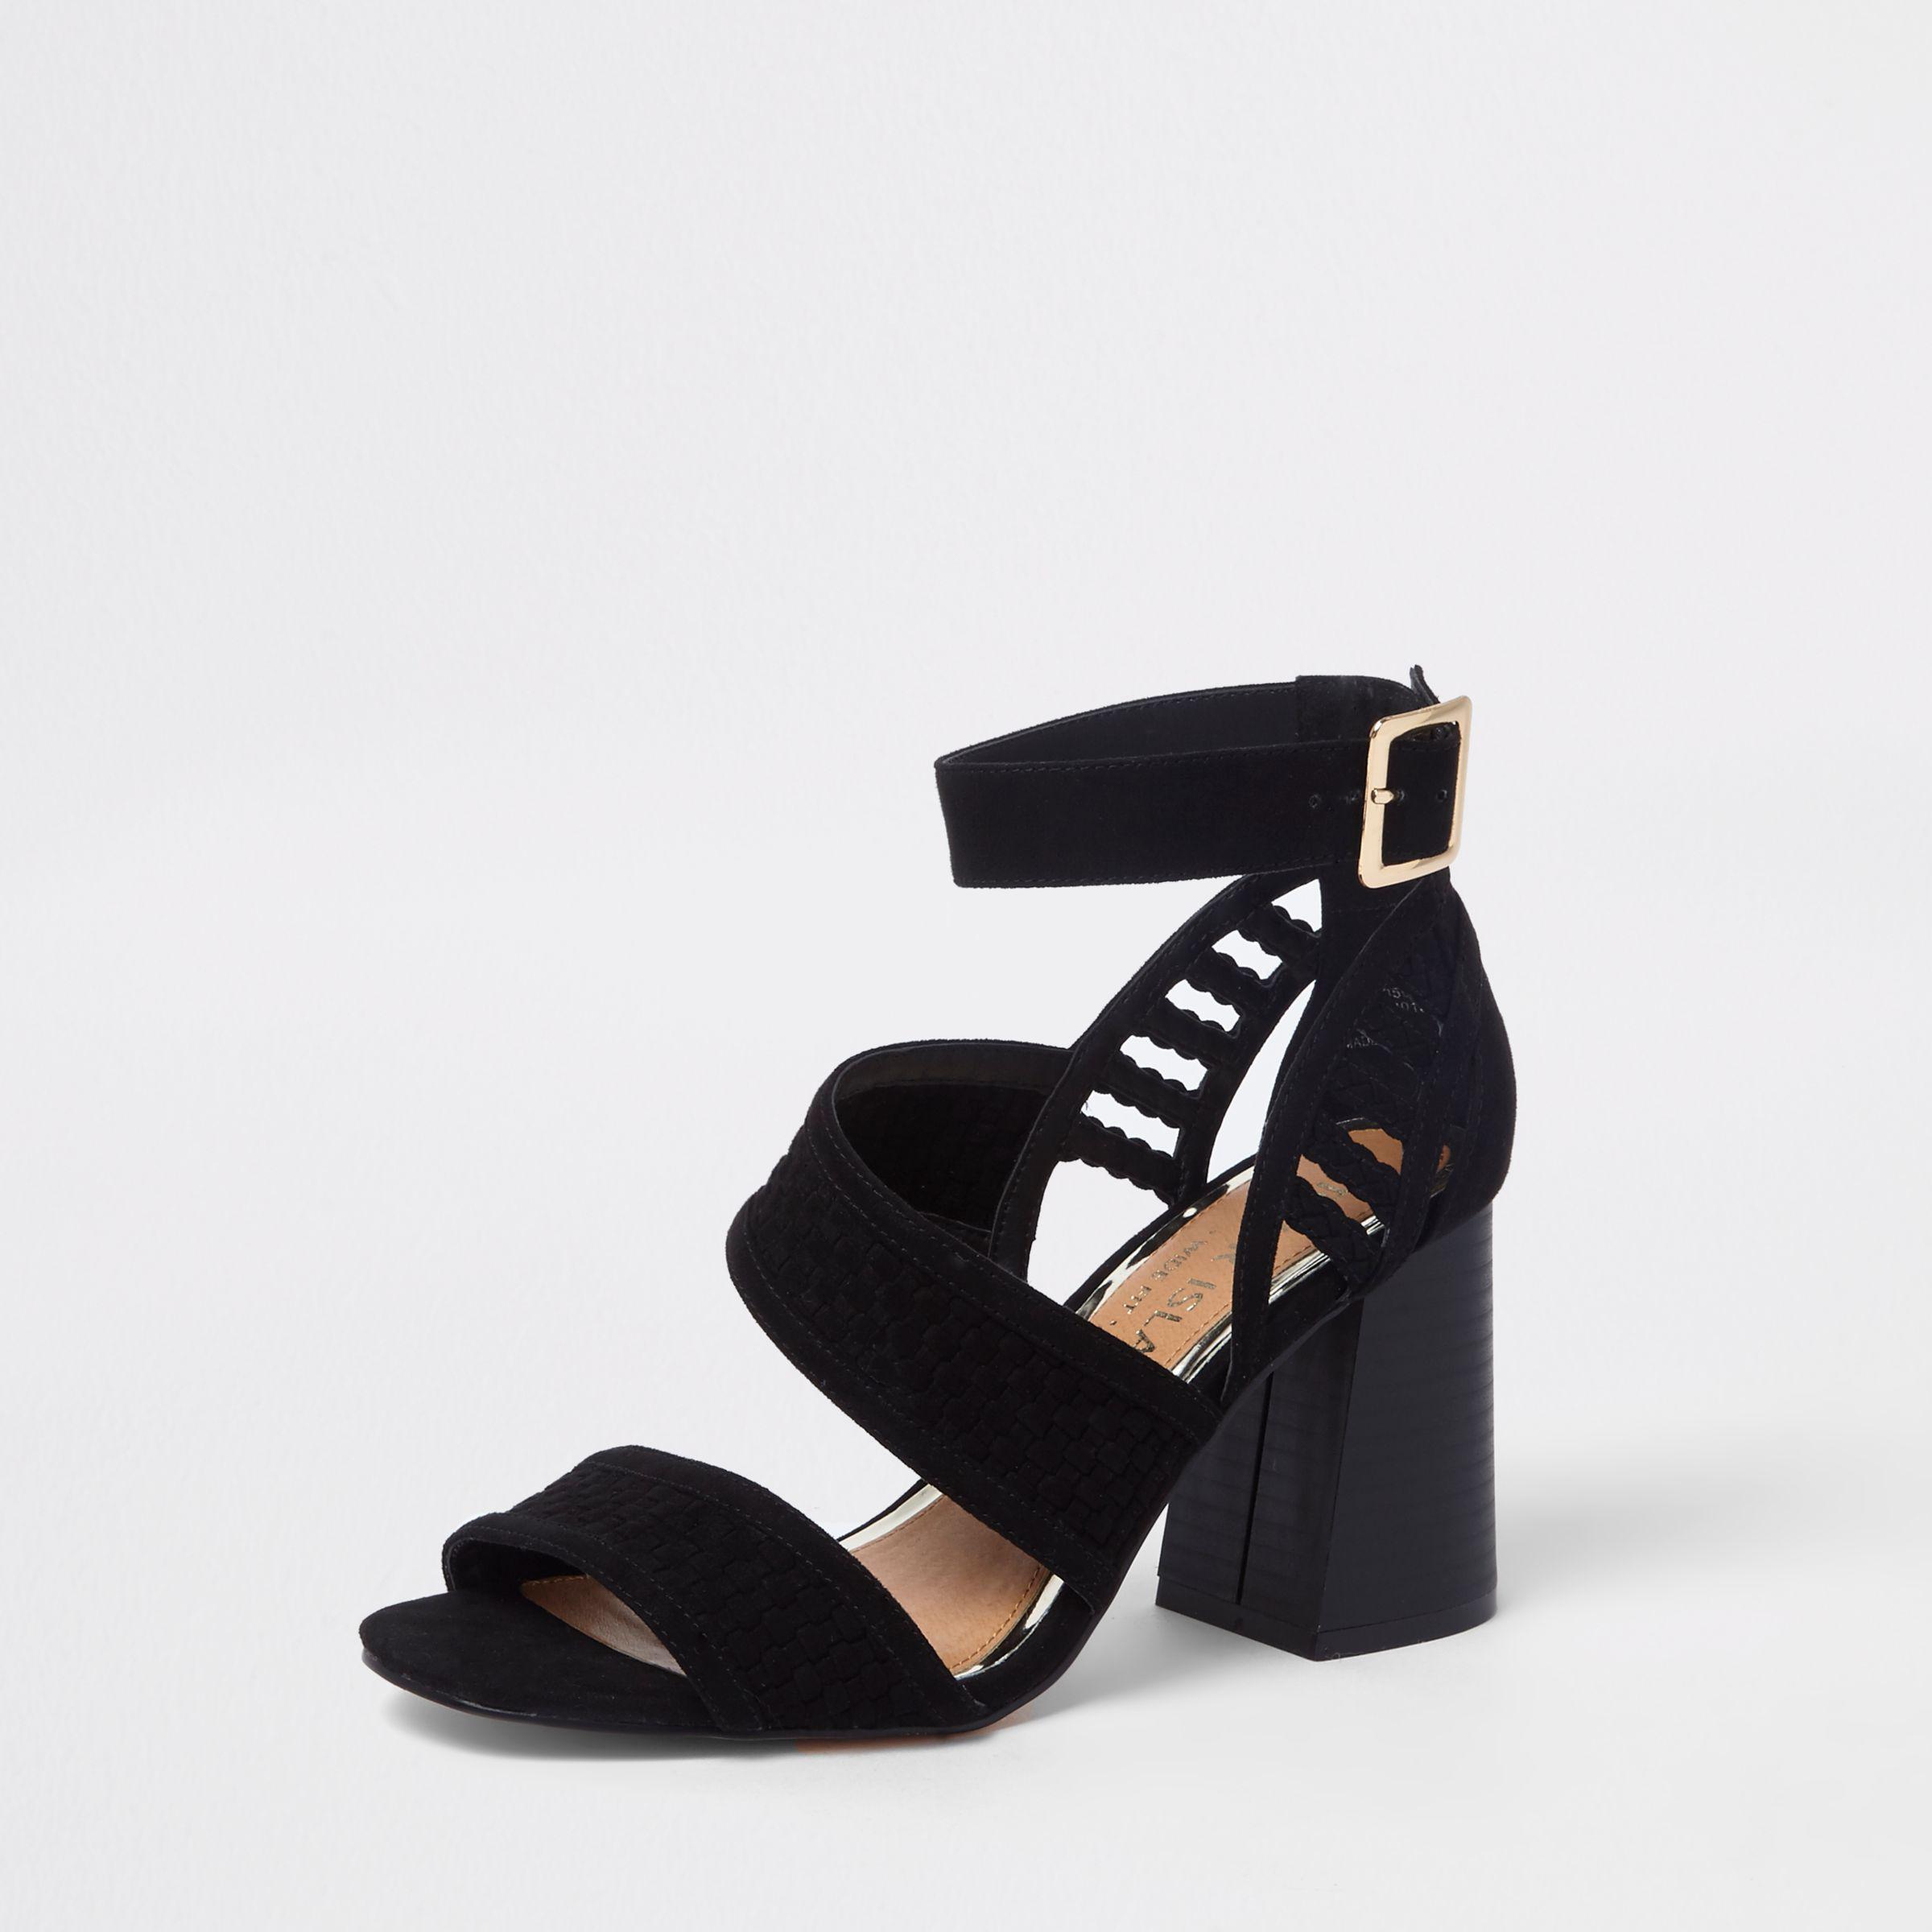 d46f49763b River Island Black Wide Fit Strappy Block Heel Sandals in Black - Lyst